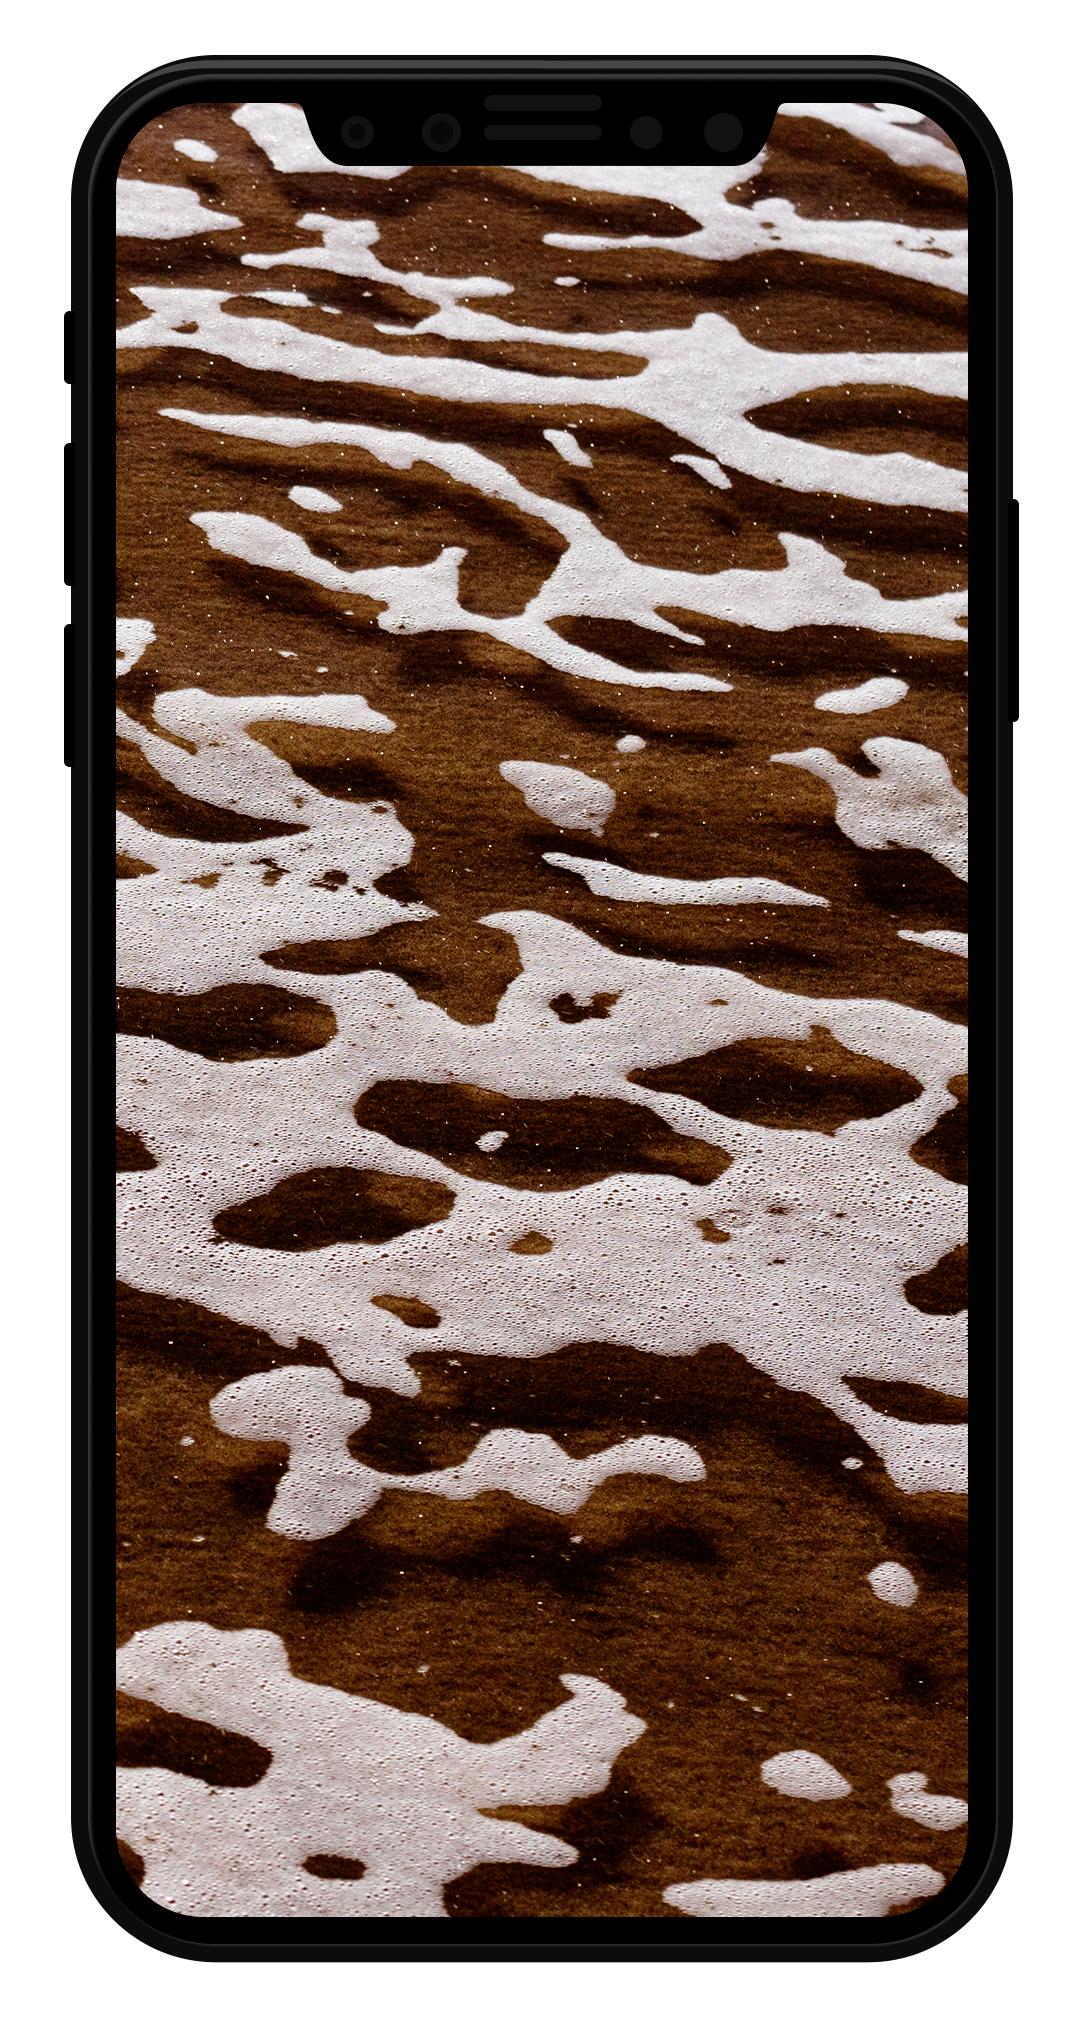 iphone-8-mockup-downloadableok.jpg